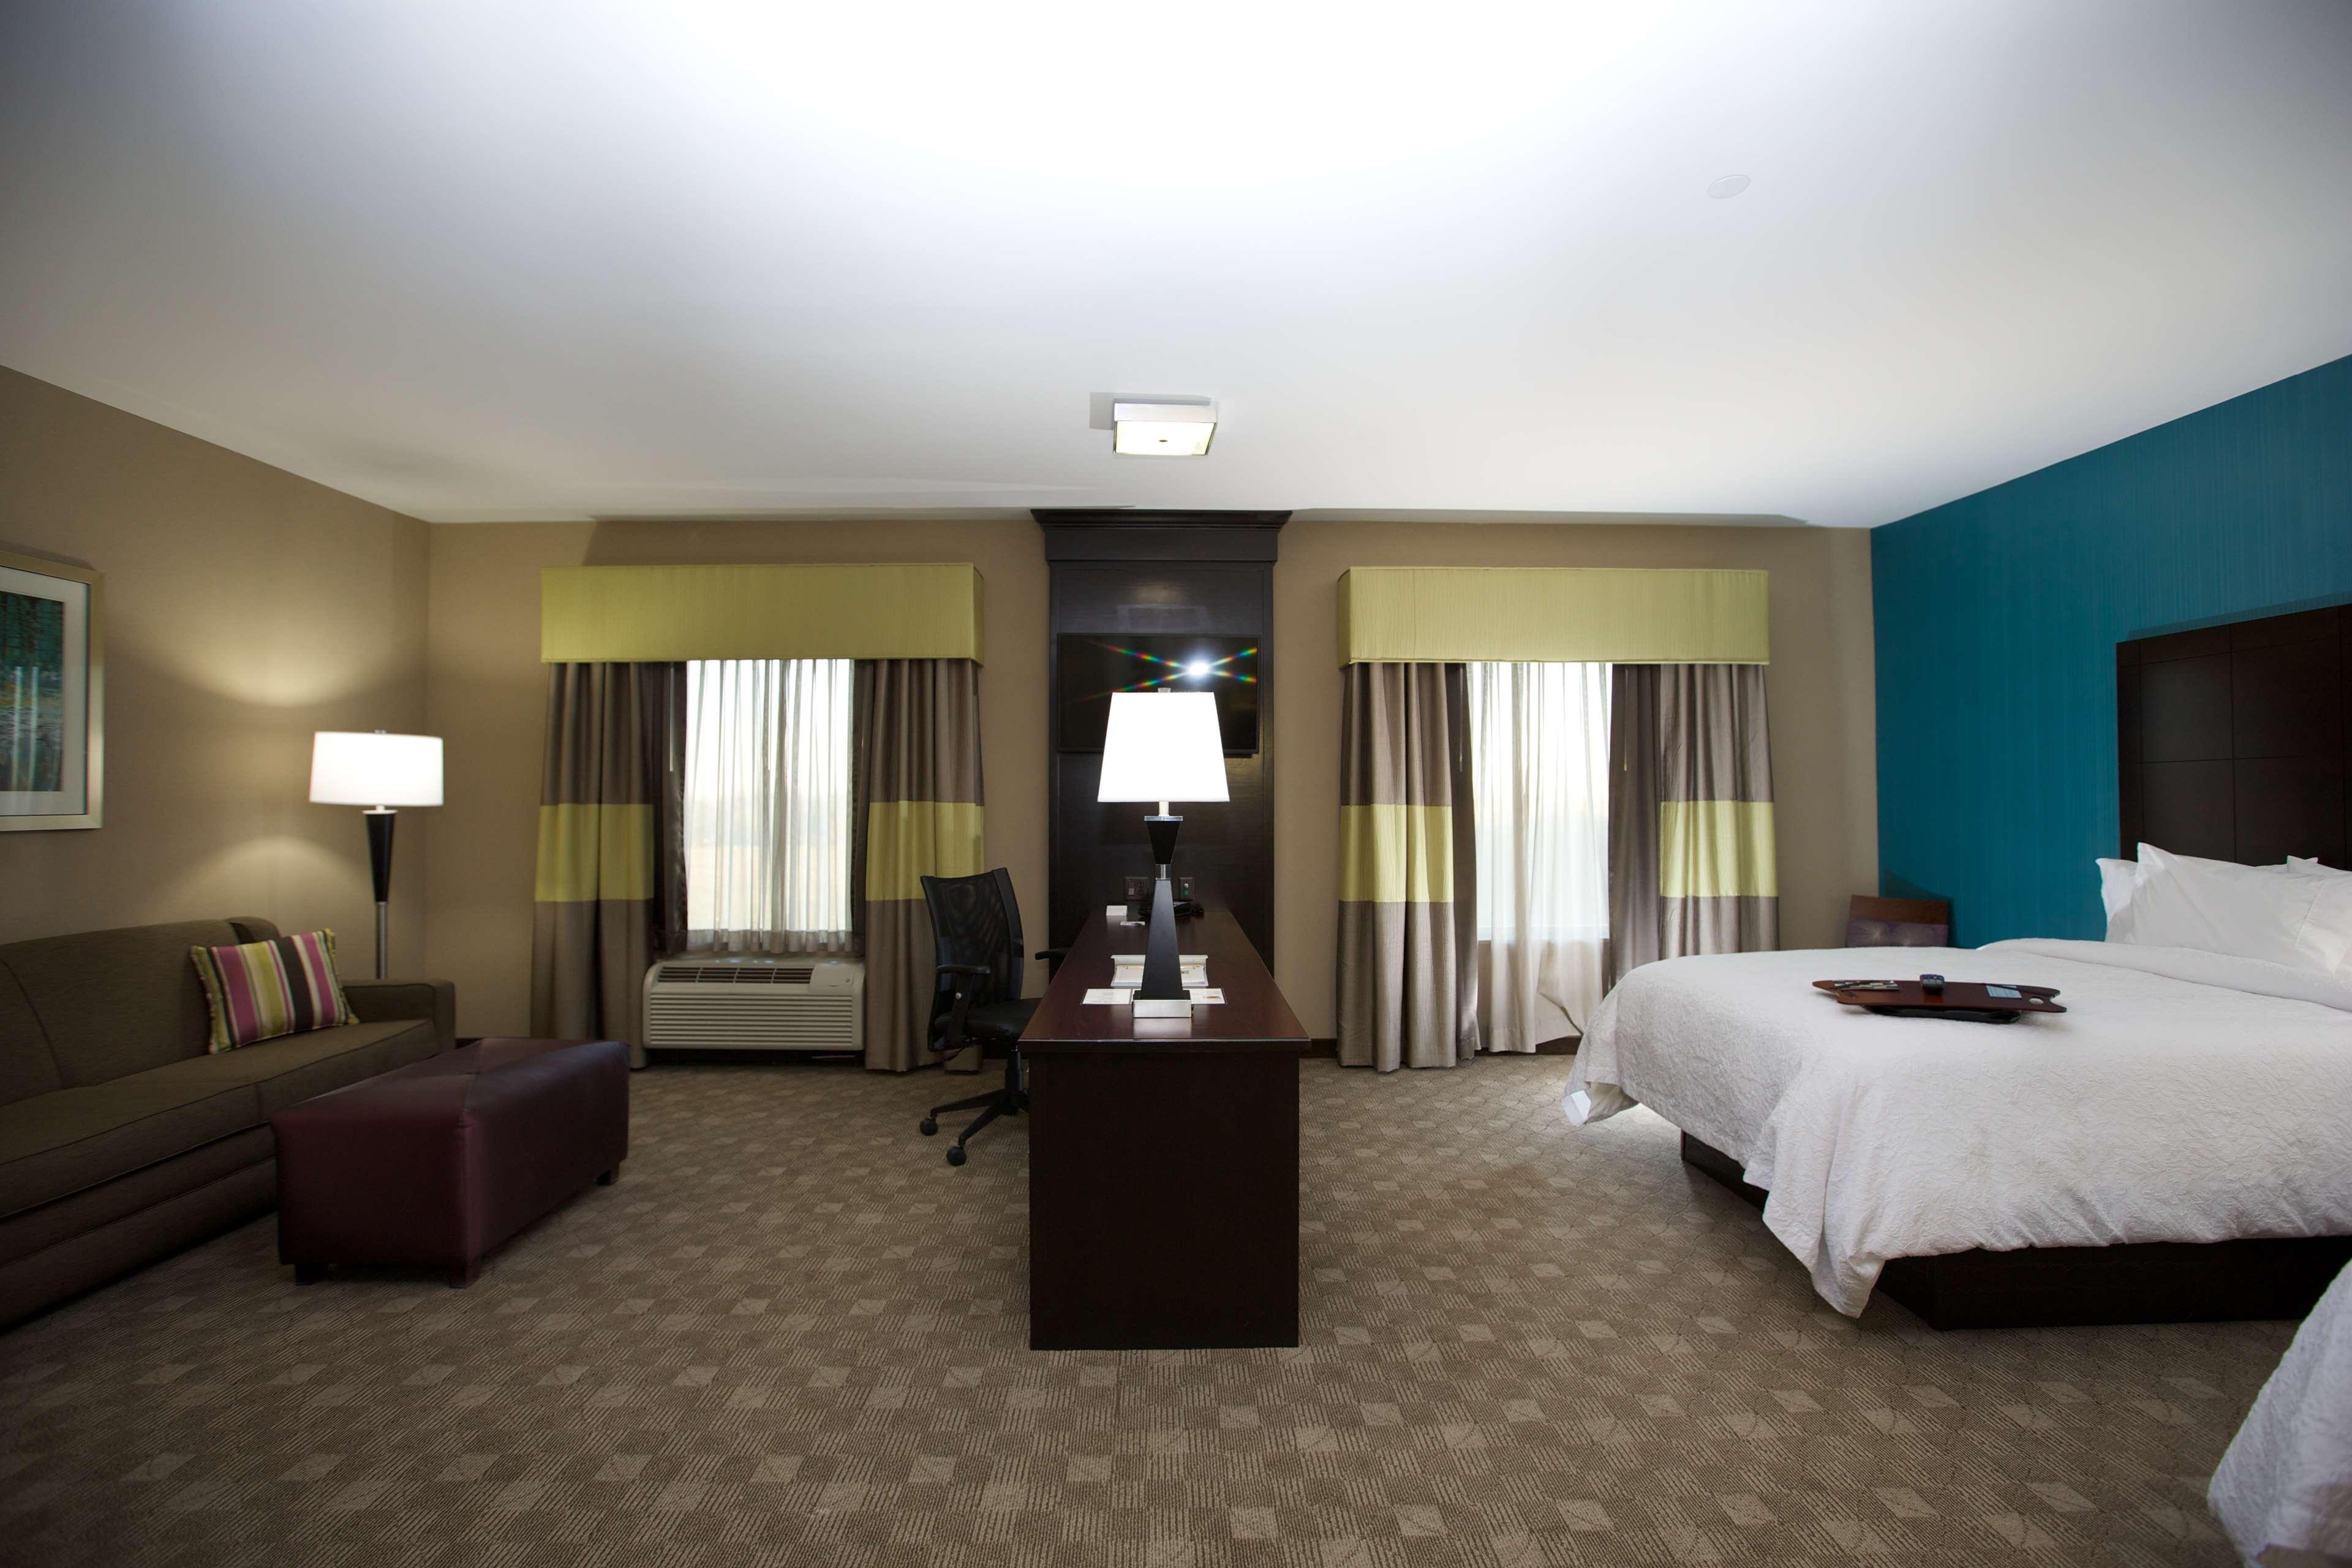 Hampton Inn & Suites Missouri City, TX image 36